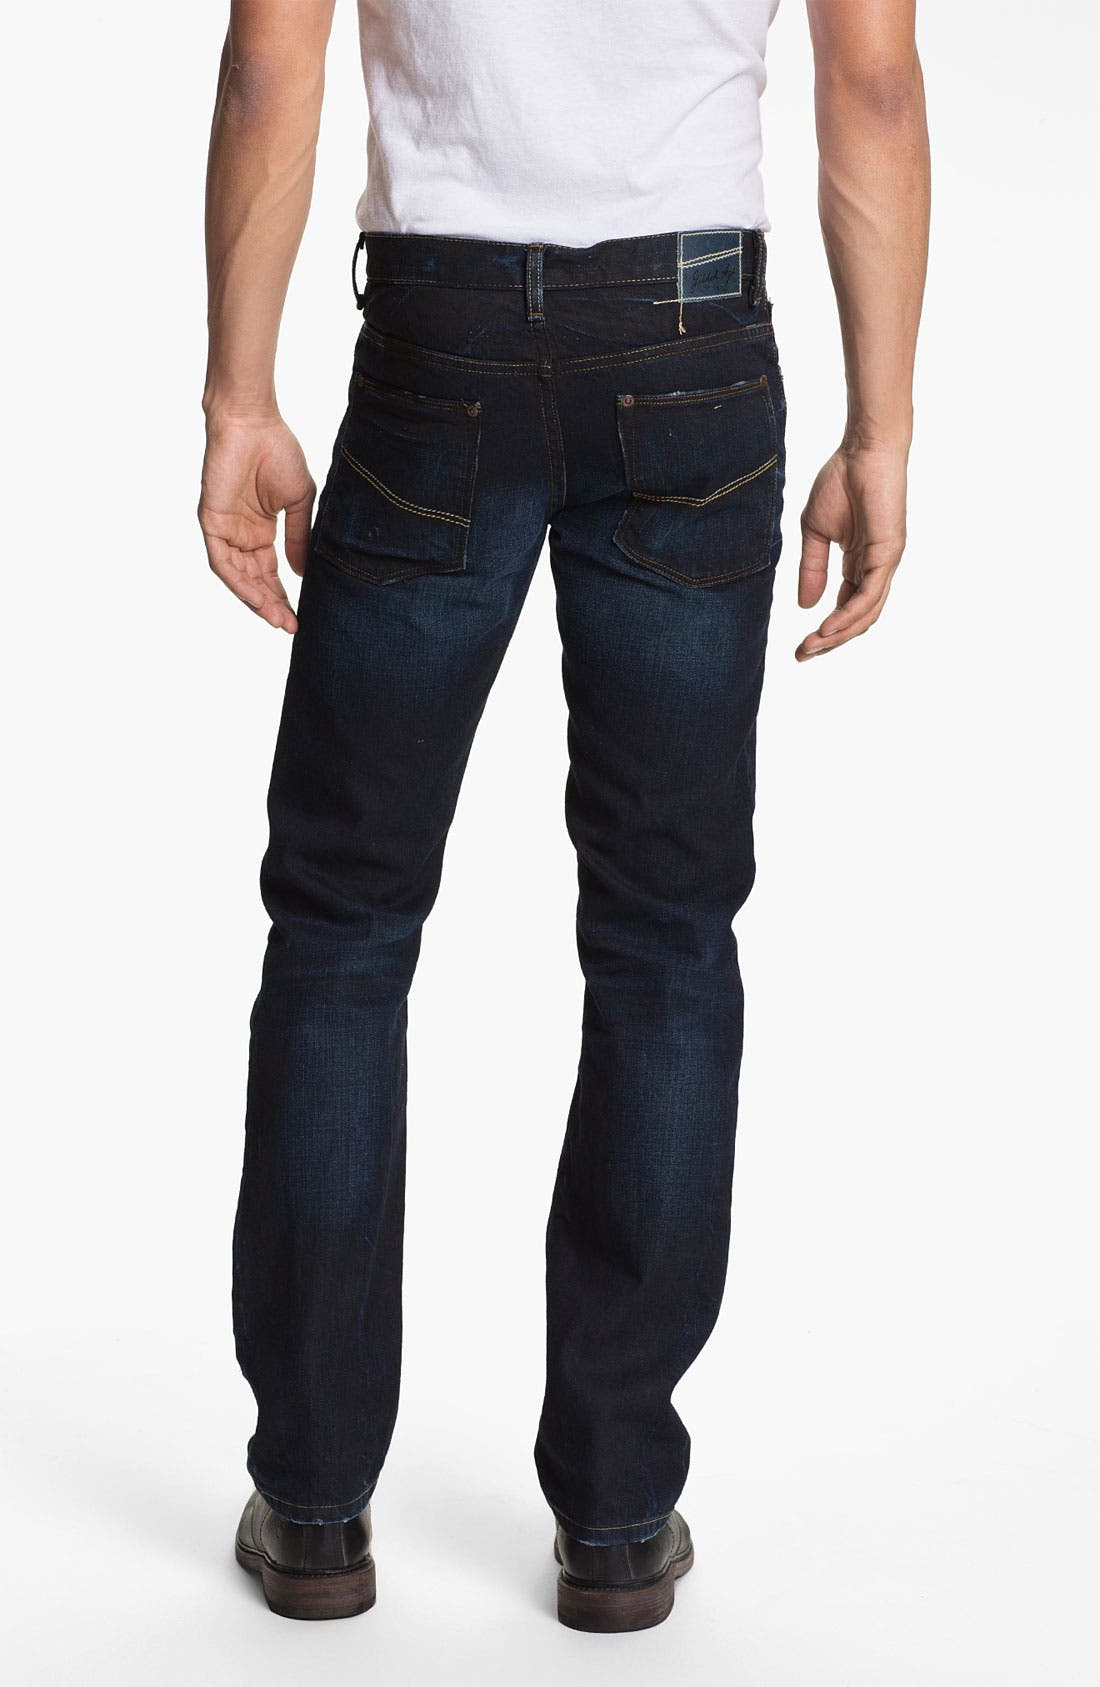 Alternate Image 1 Selected - Gilded Age 'Gotham' Slim Straight Leg Jeans (Dark Wash)